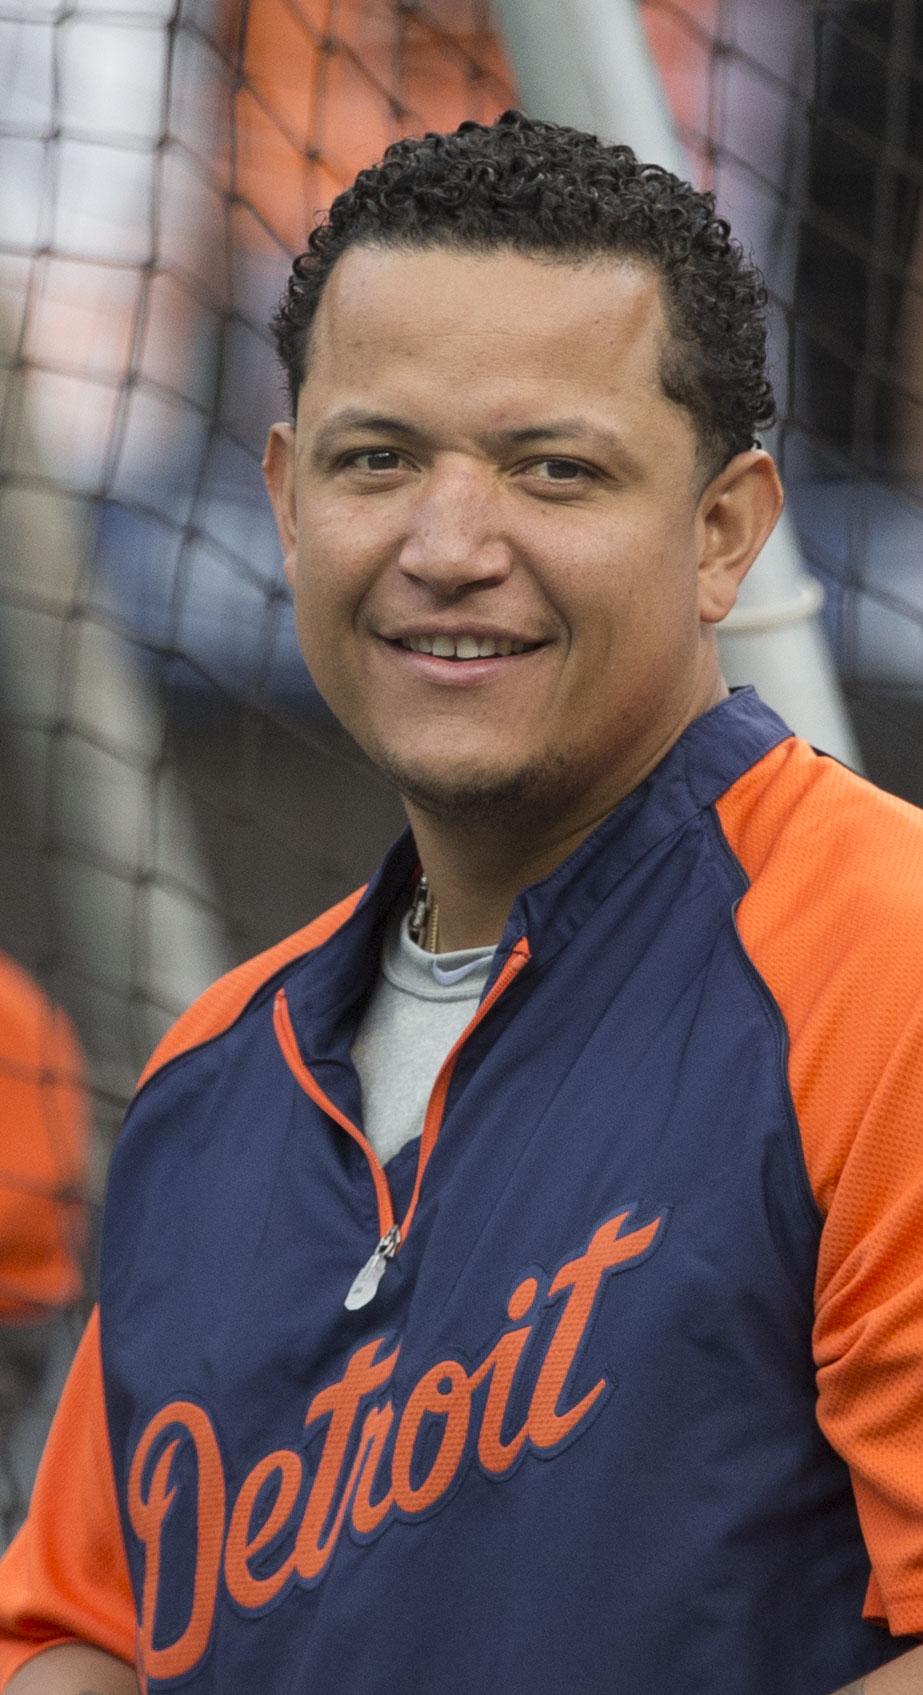 Cabrera during batting practice in 2014.